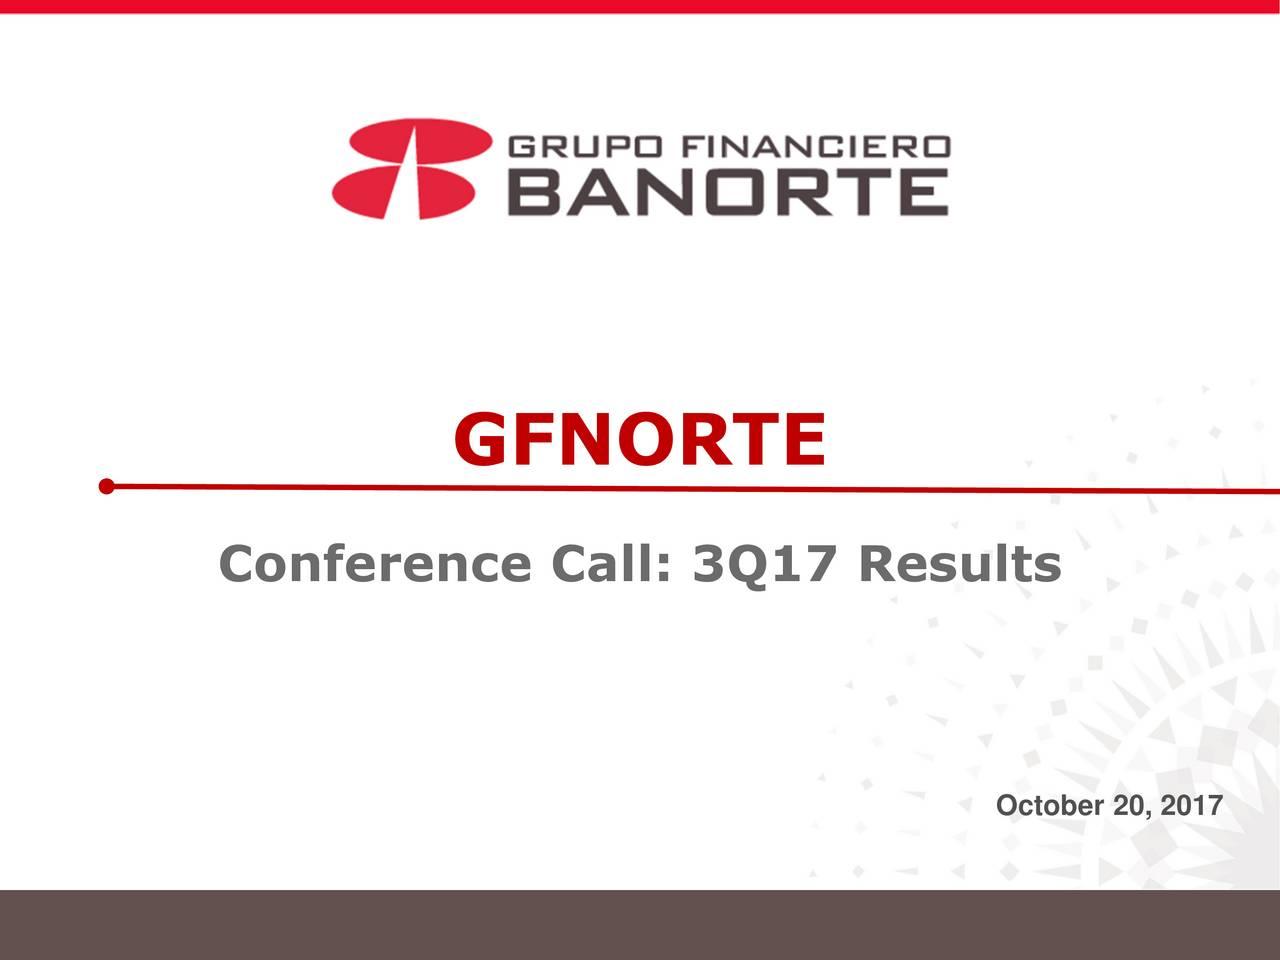 Banorte: GBOOY / Grupo Financiero Banorte, S.A.B. De C.V.